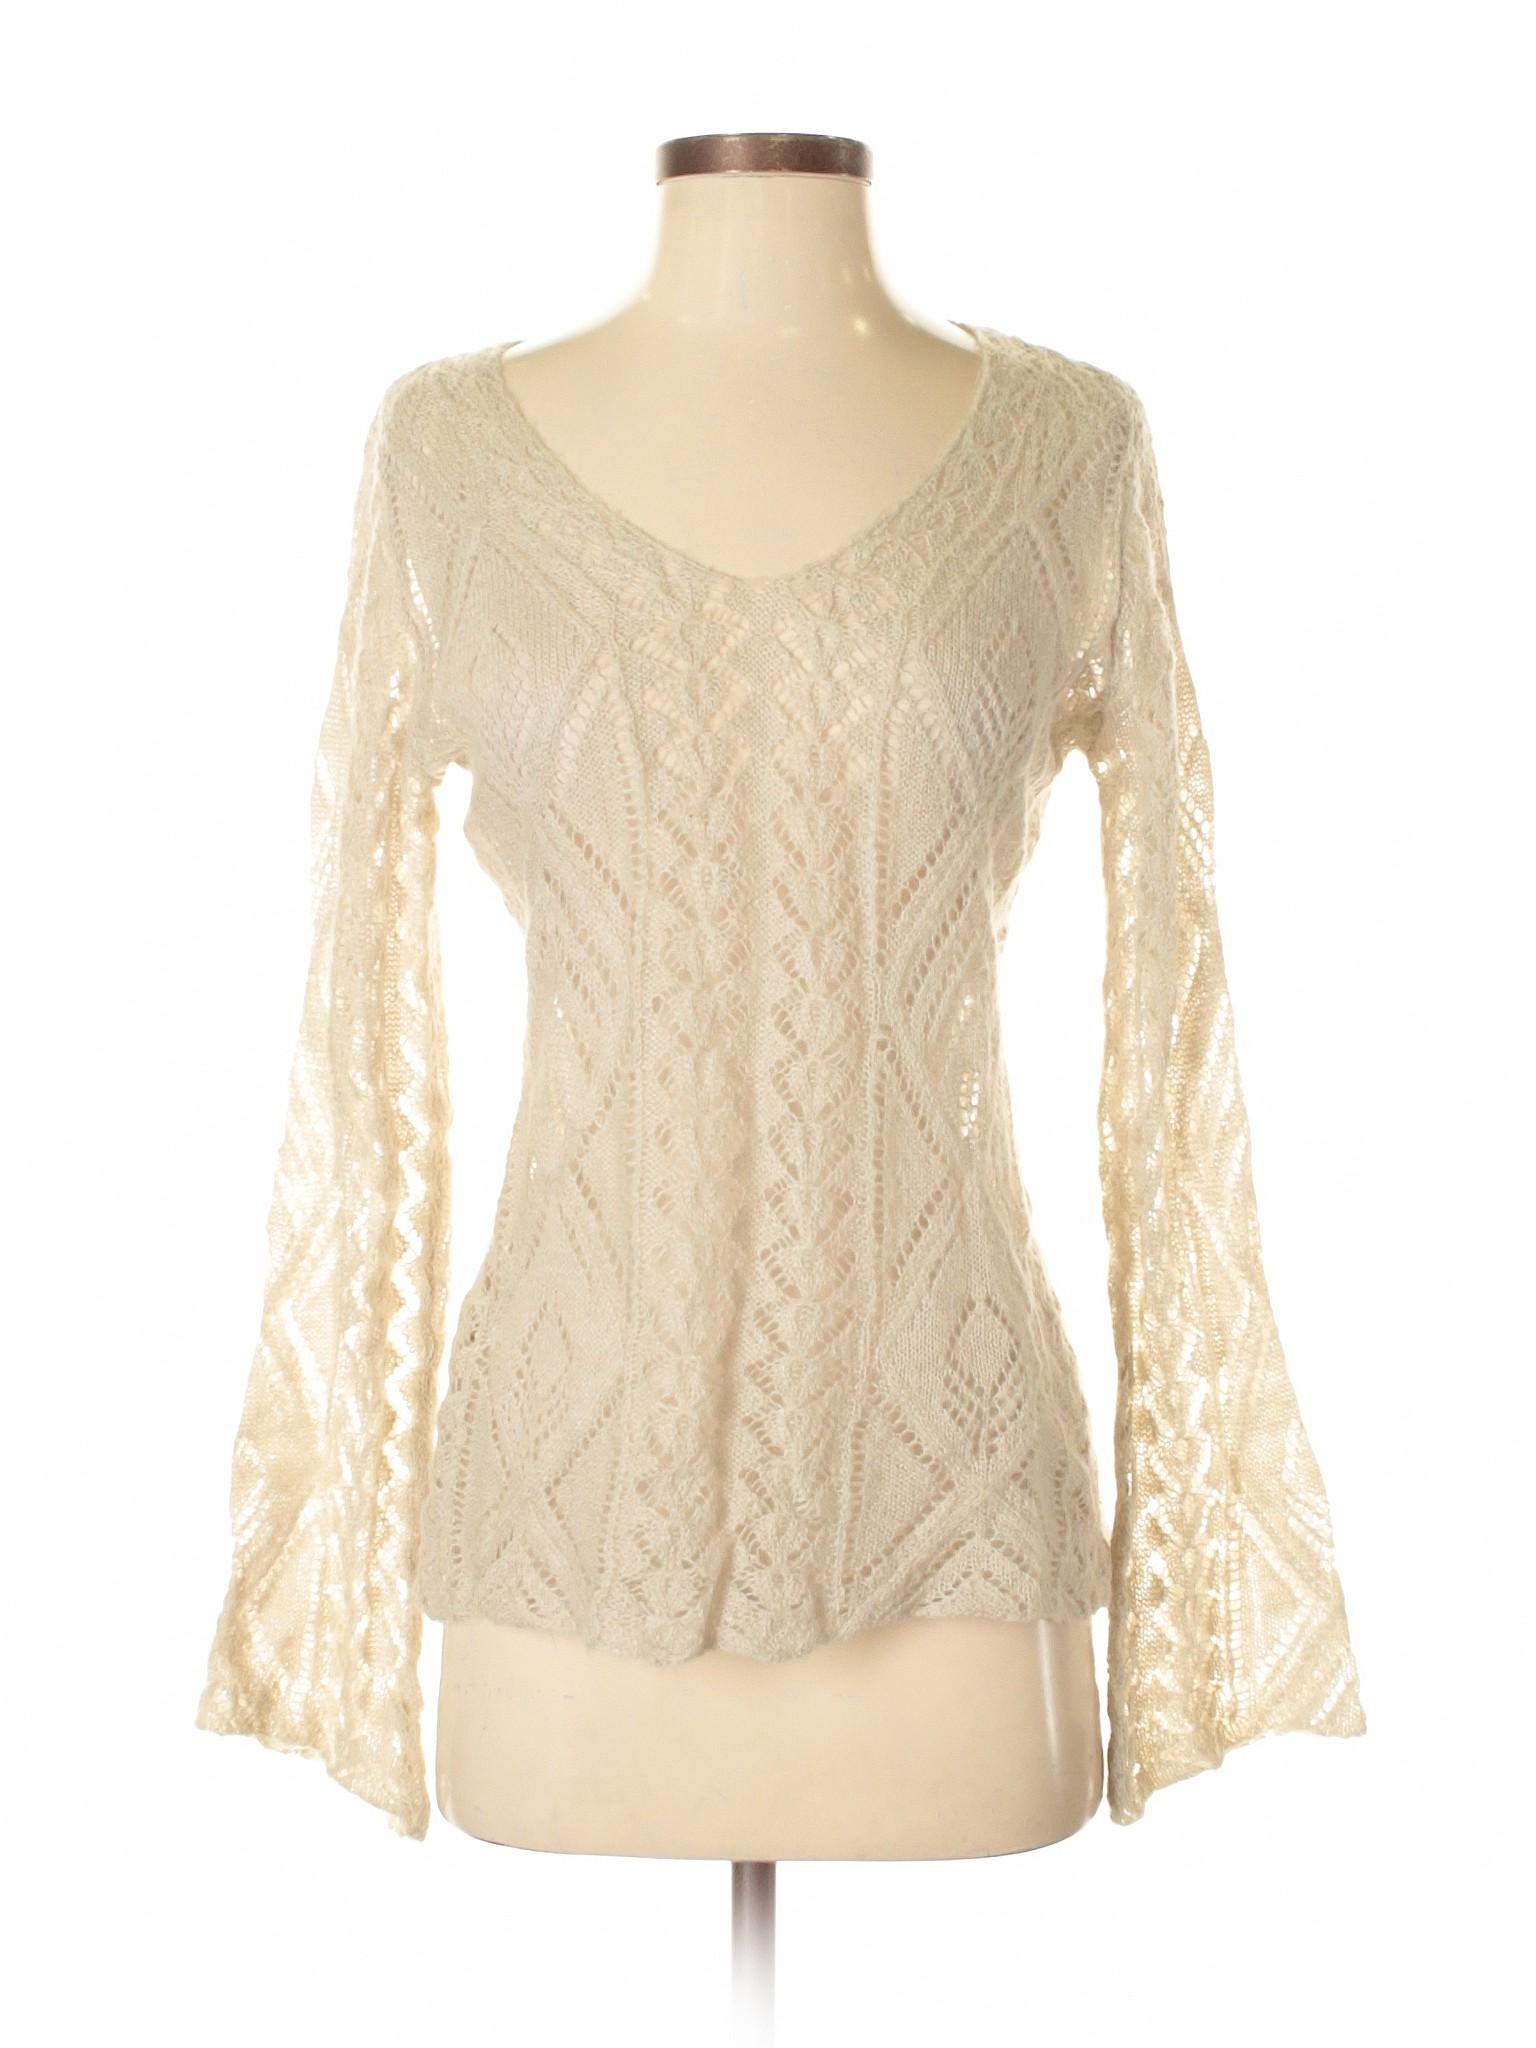 Sweater Boutique Pullover Boutique CAbi Sweater Pullover CAbi CAbi Pullover Boutique Sweater qBwvTnRIx